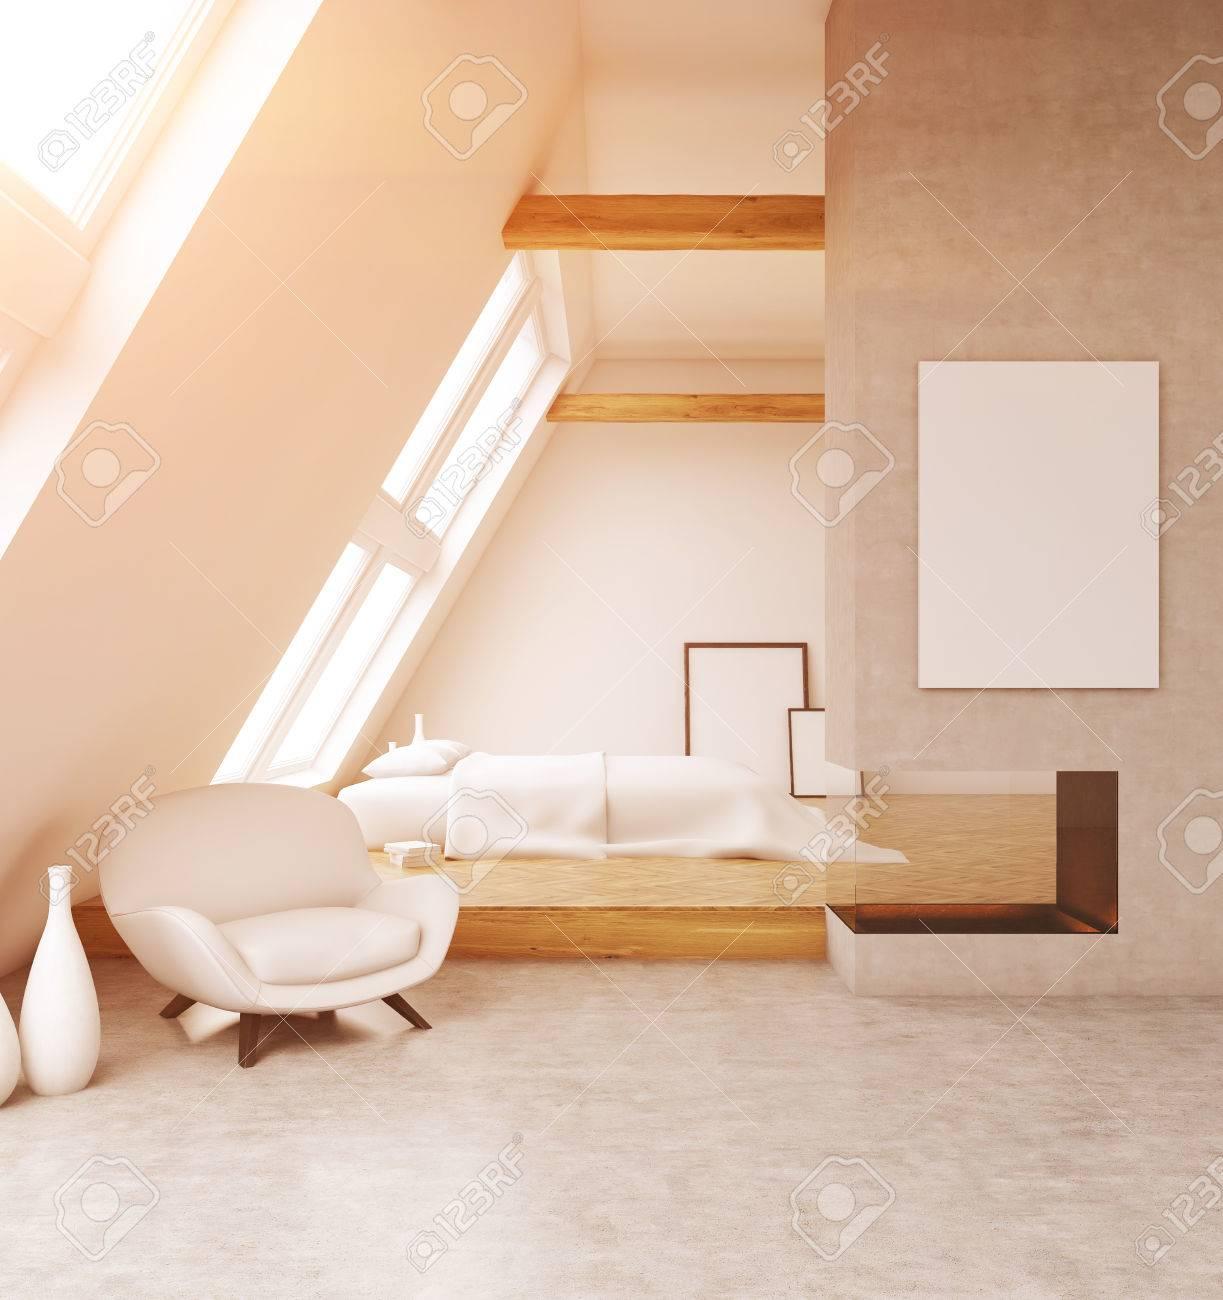 Komfortable Zimmer Im Modernen Haus. Big Bett, Weiße Sessel, Poster An Den  Wänden